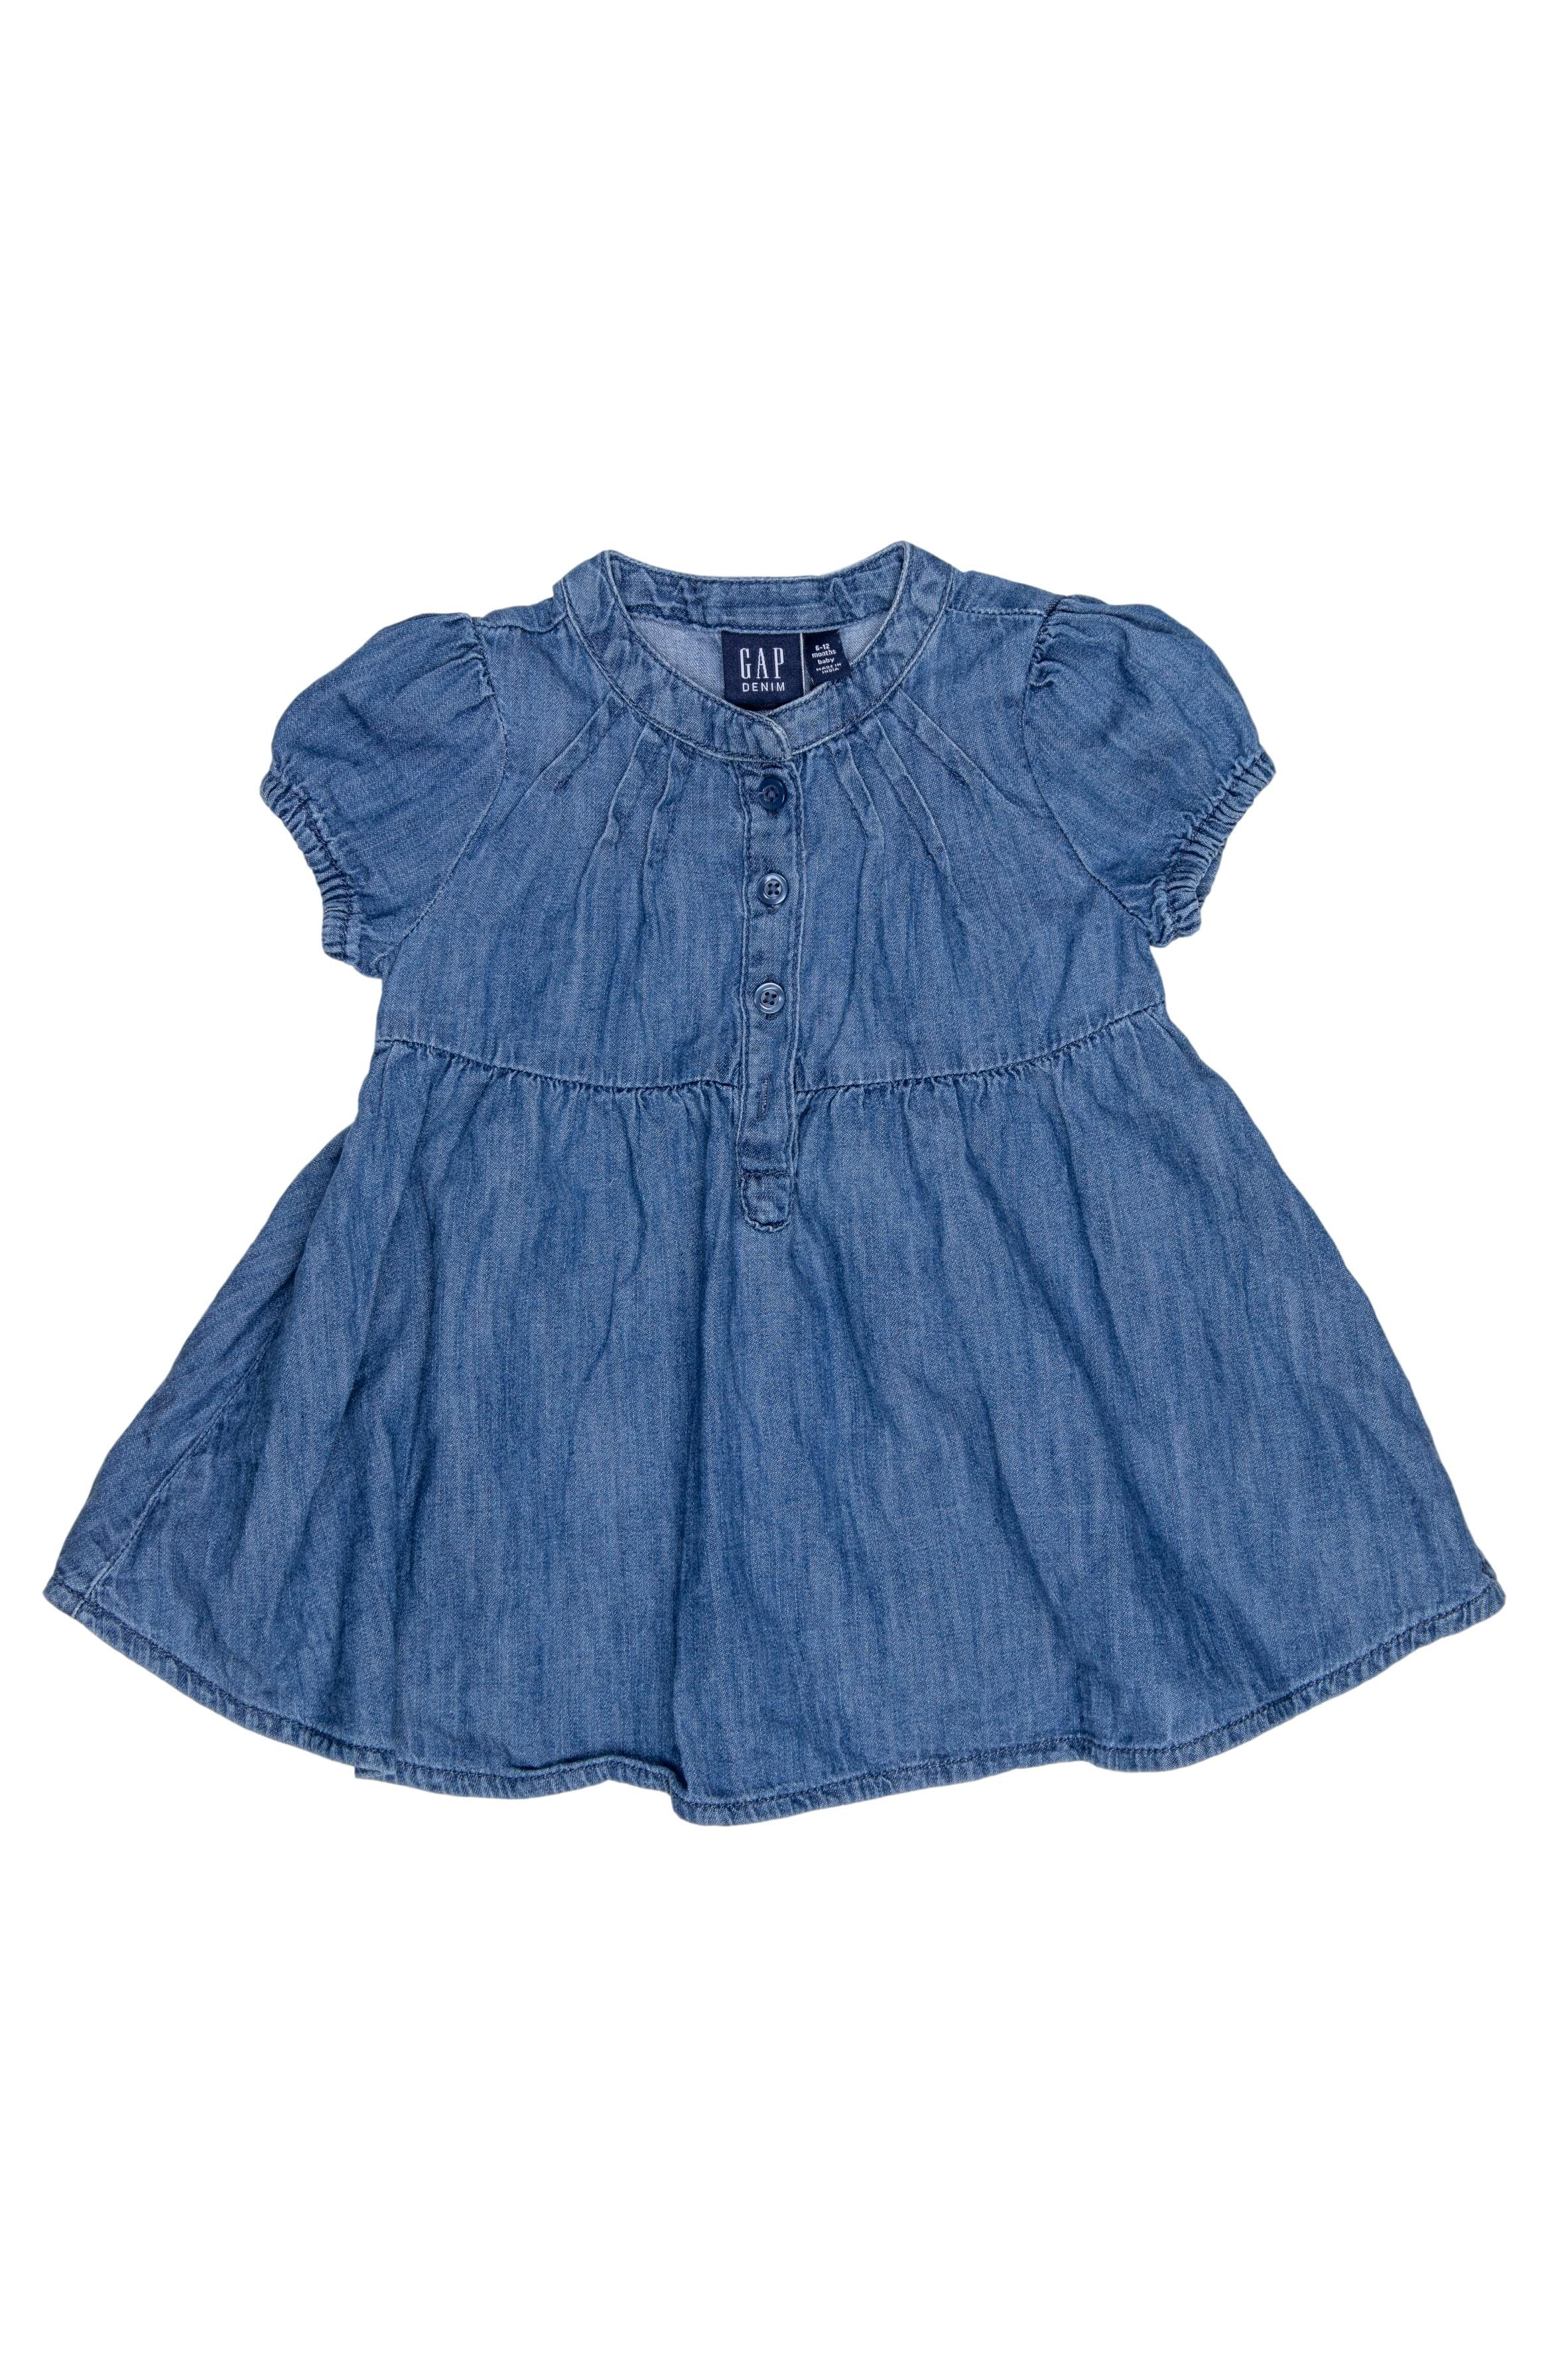 Vestido de jean manga corta tipo camisero, 100% algodon. Talla en etiqueta: 6 - 12 M - Gap